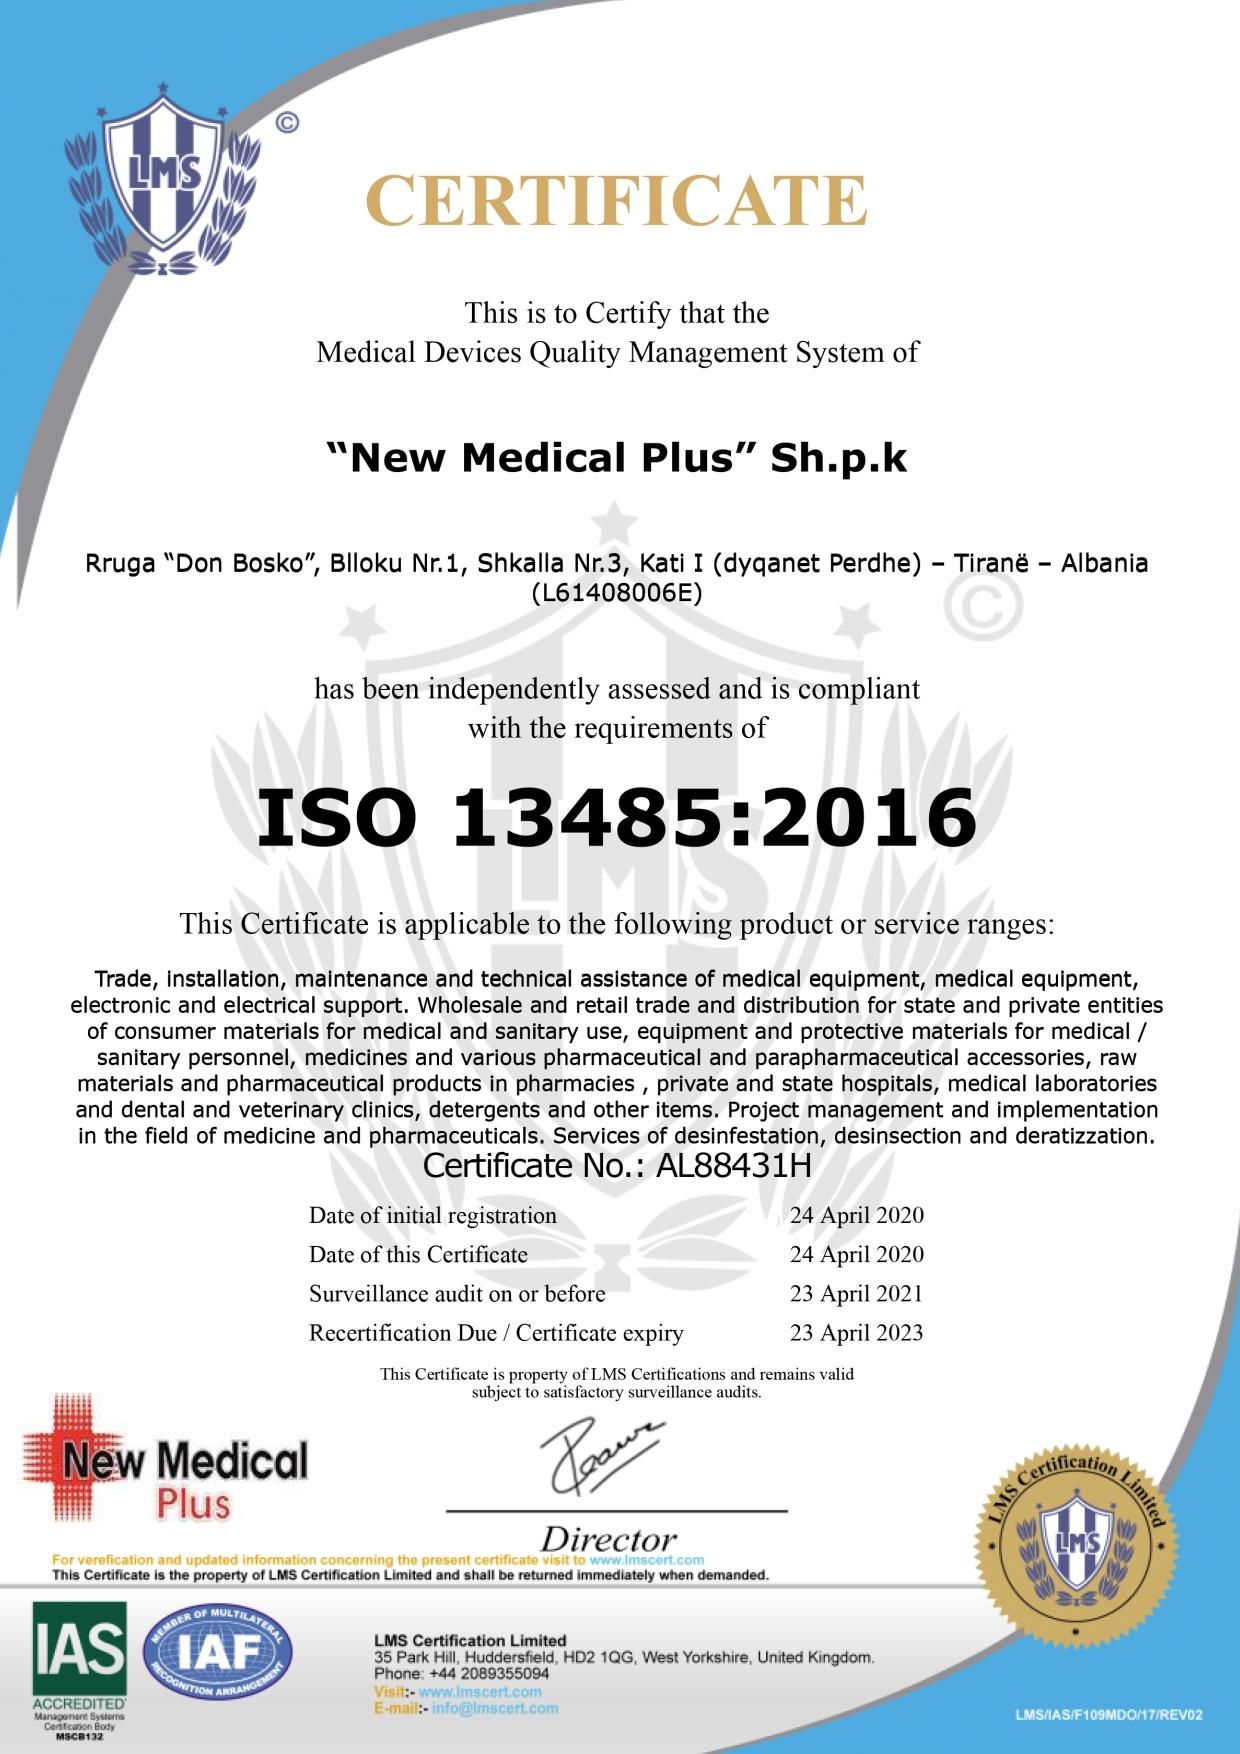 NEW MEDICAL PLUS WEBSITE CERTIFIKATA 7